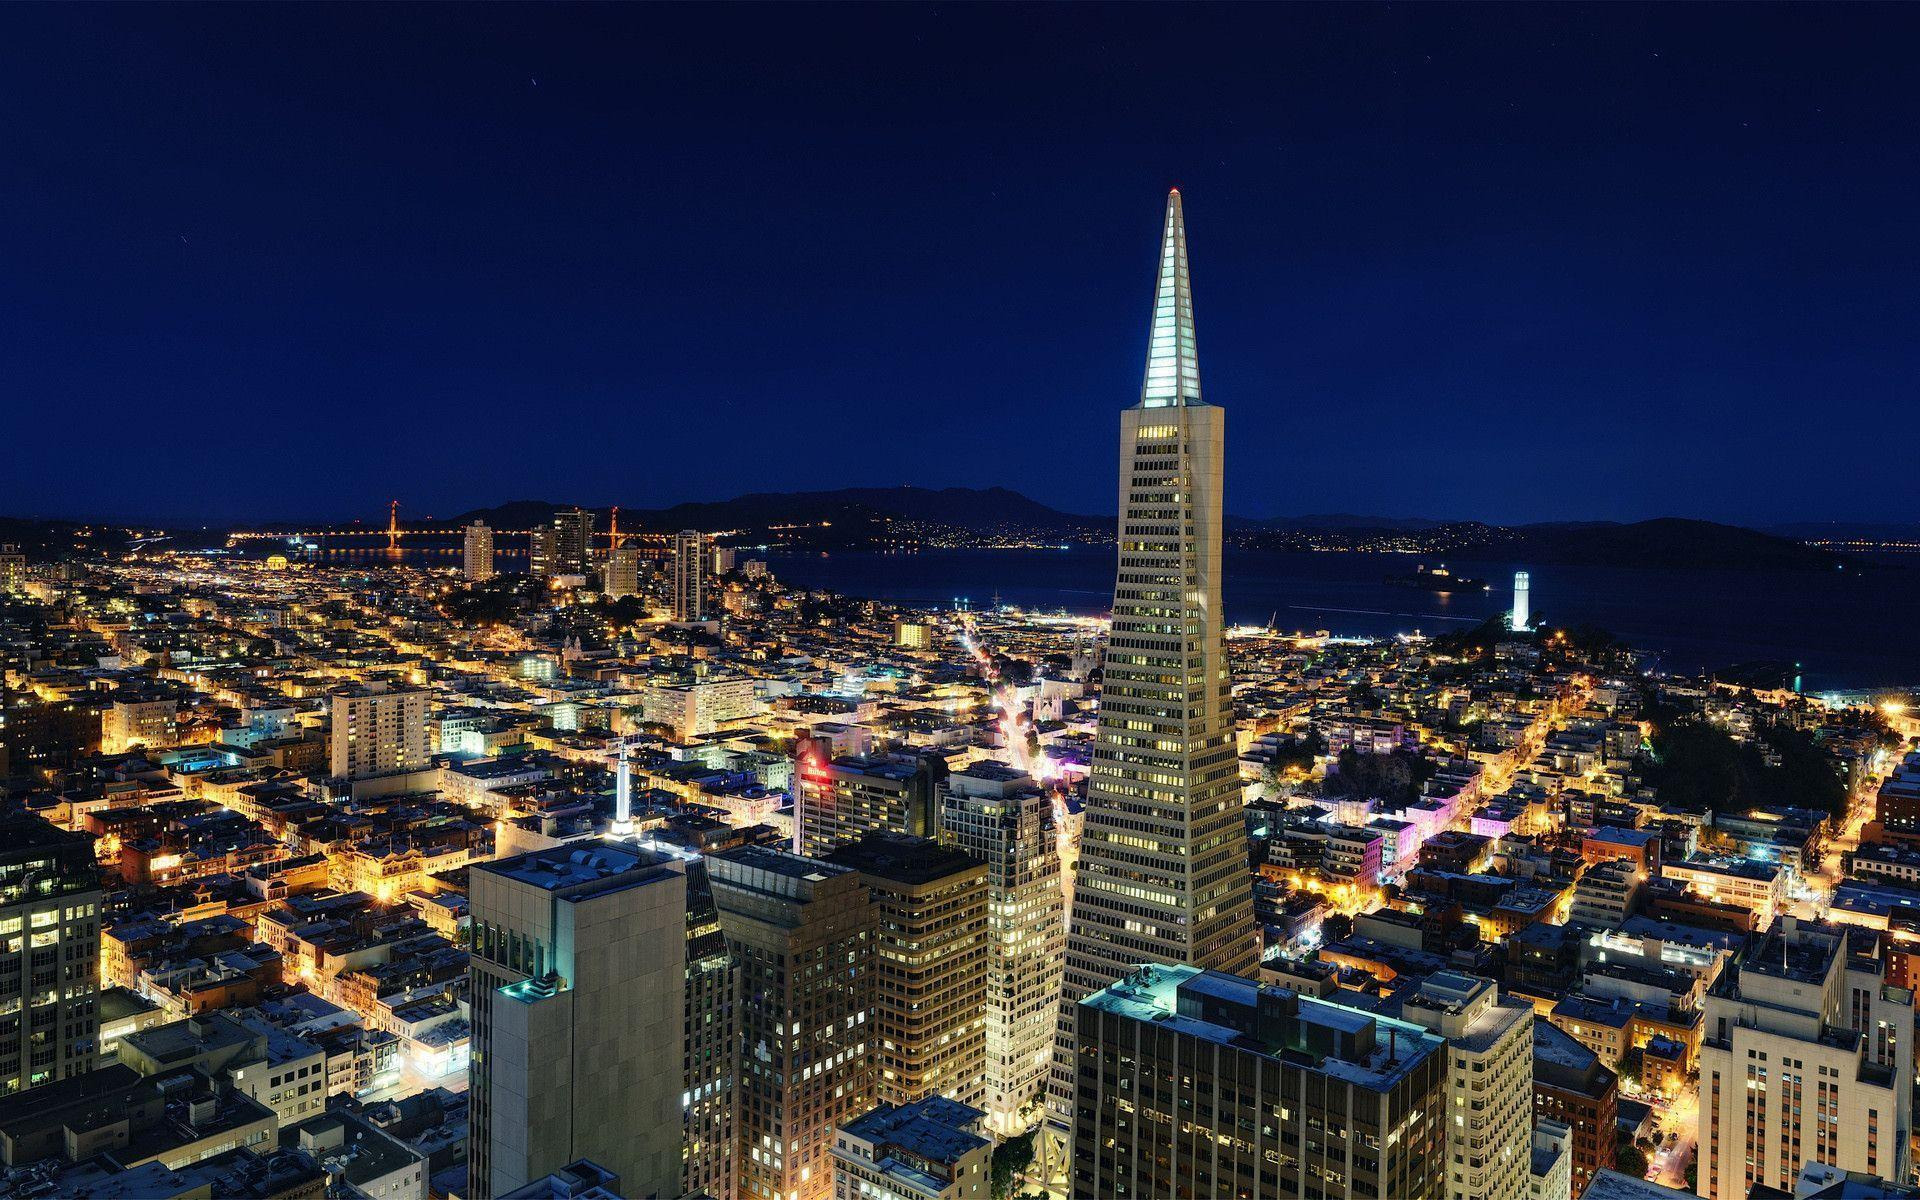 San Francisco Desktop Backgrounds - Wallpaper Cave